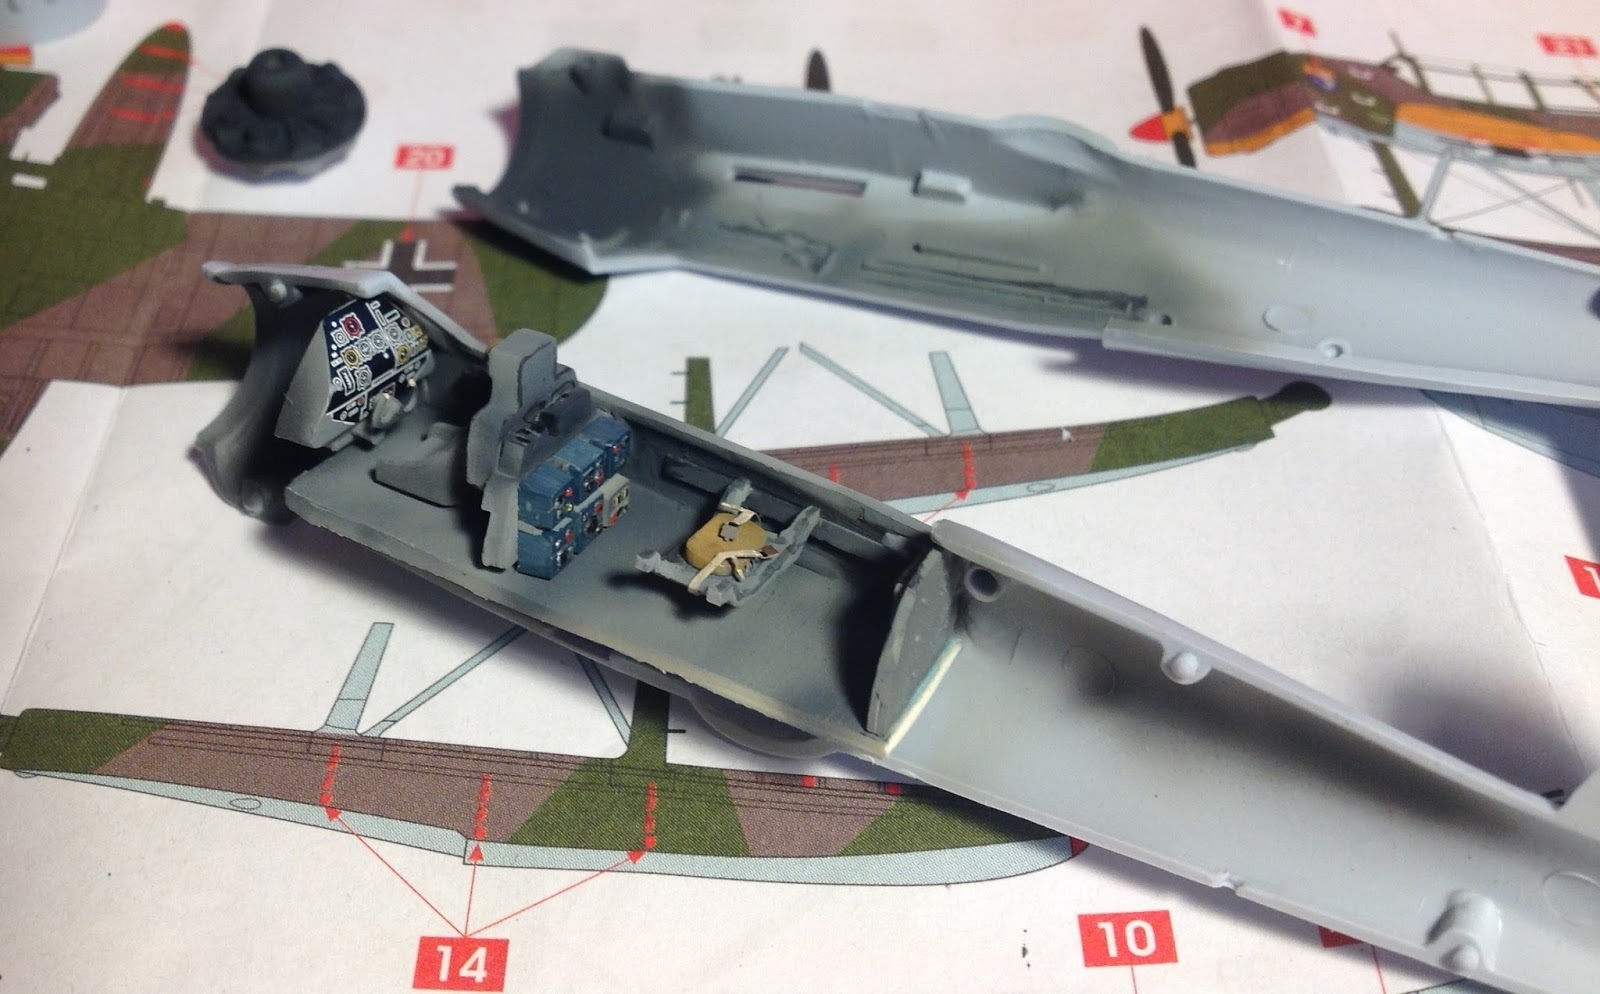 1/72 Scale Kits & Diorama: ARADO AR-196 A-3 Water Diorama